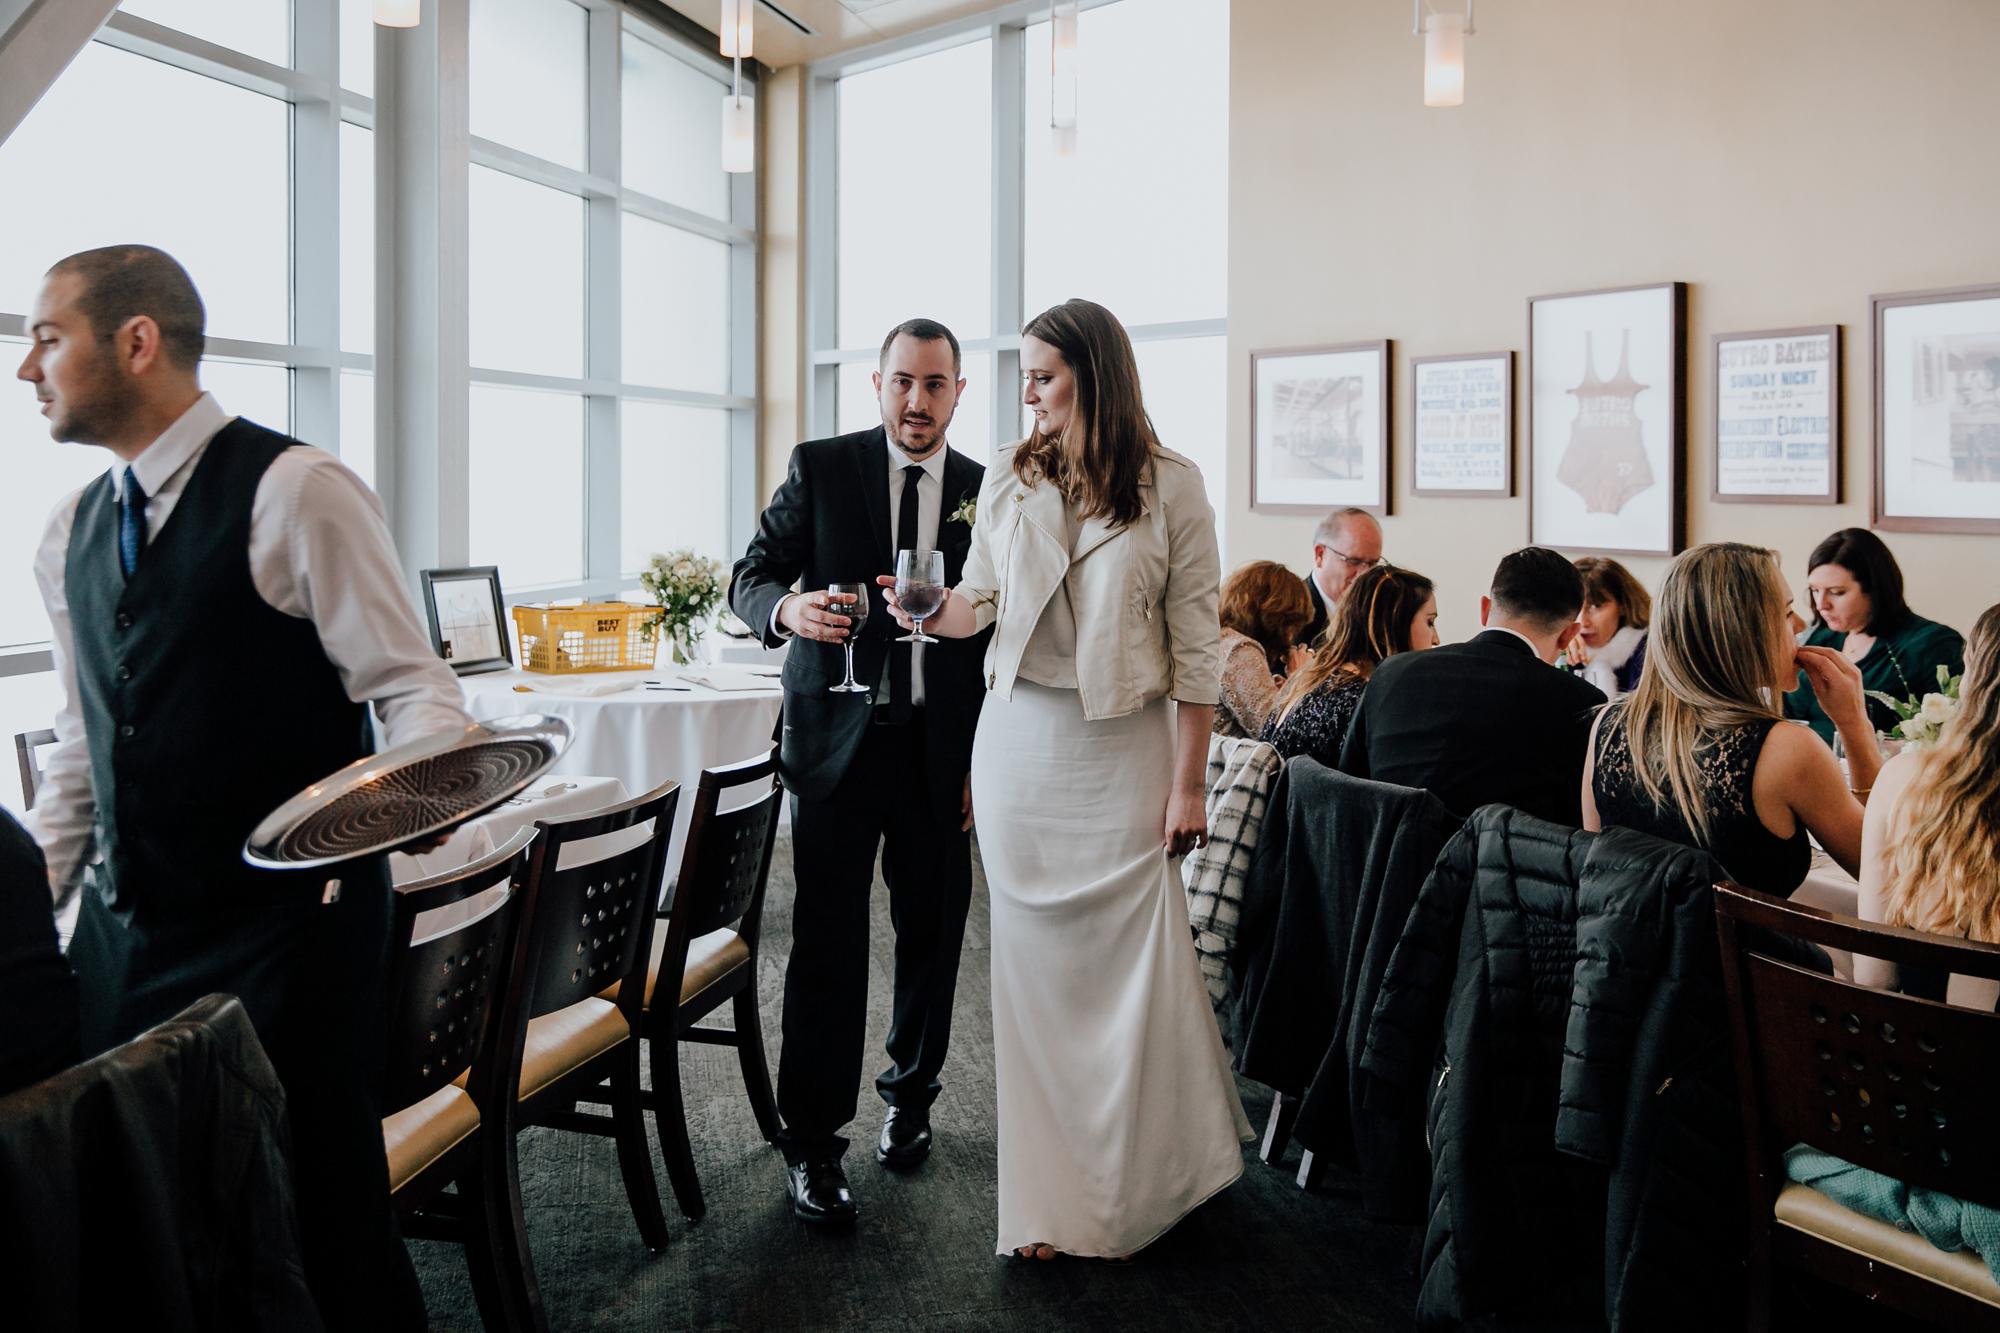 san-francisco-city-hall-wedding-marble-rye-photography-011749.JPG